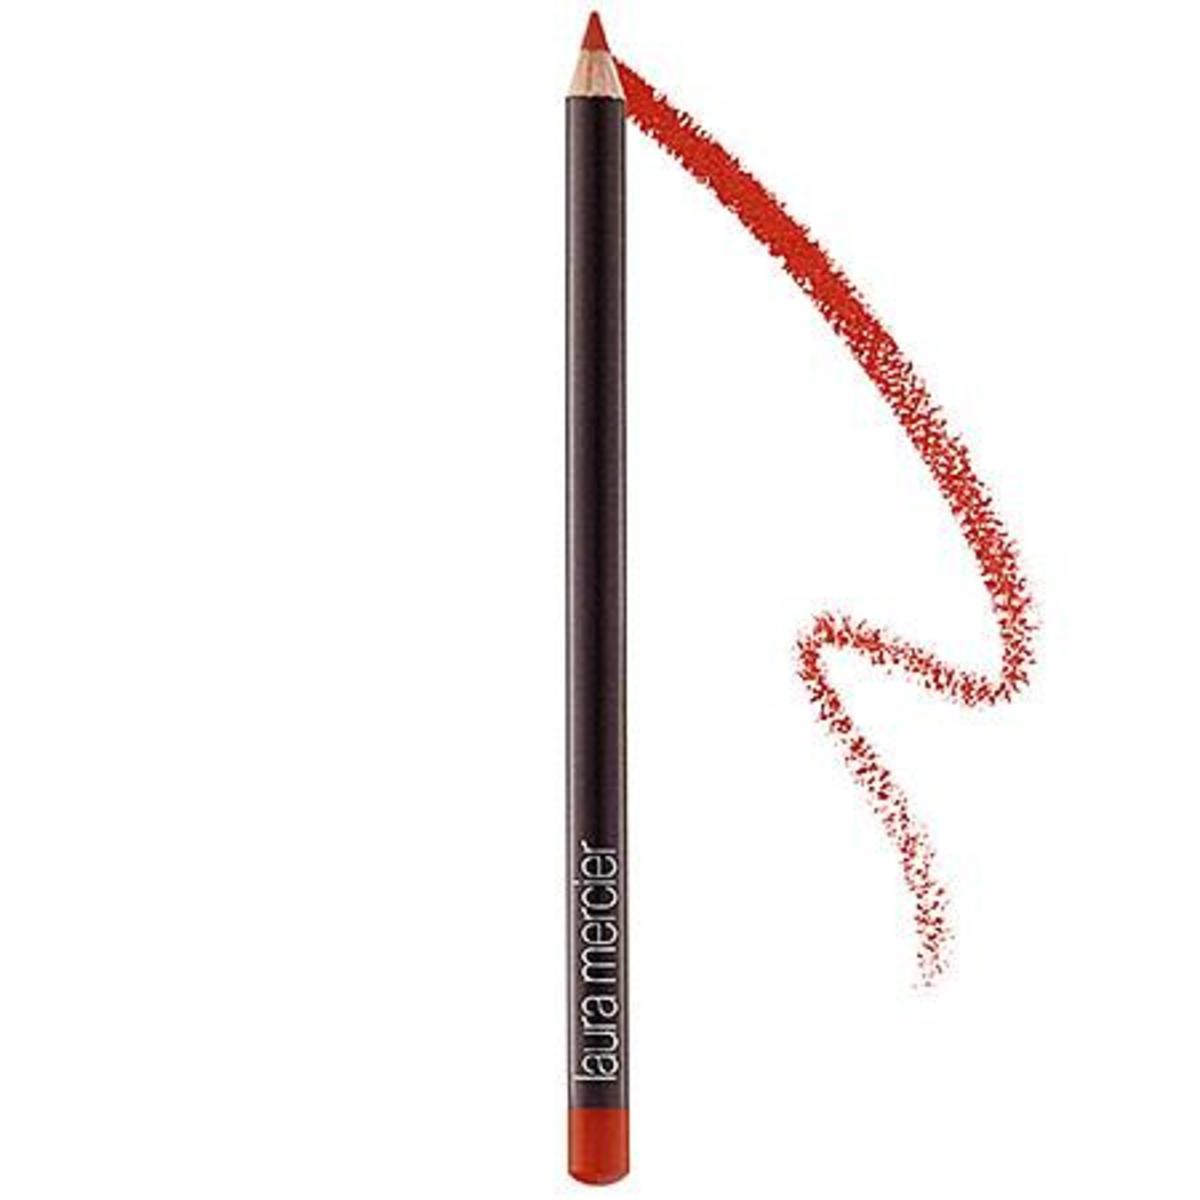 Laura Mercier Lip Pencil in Warm Poppy